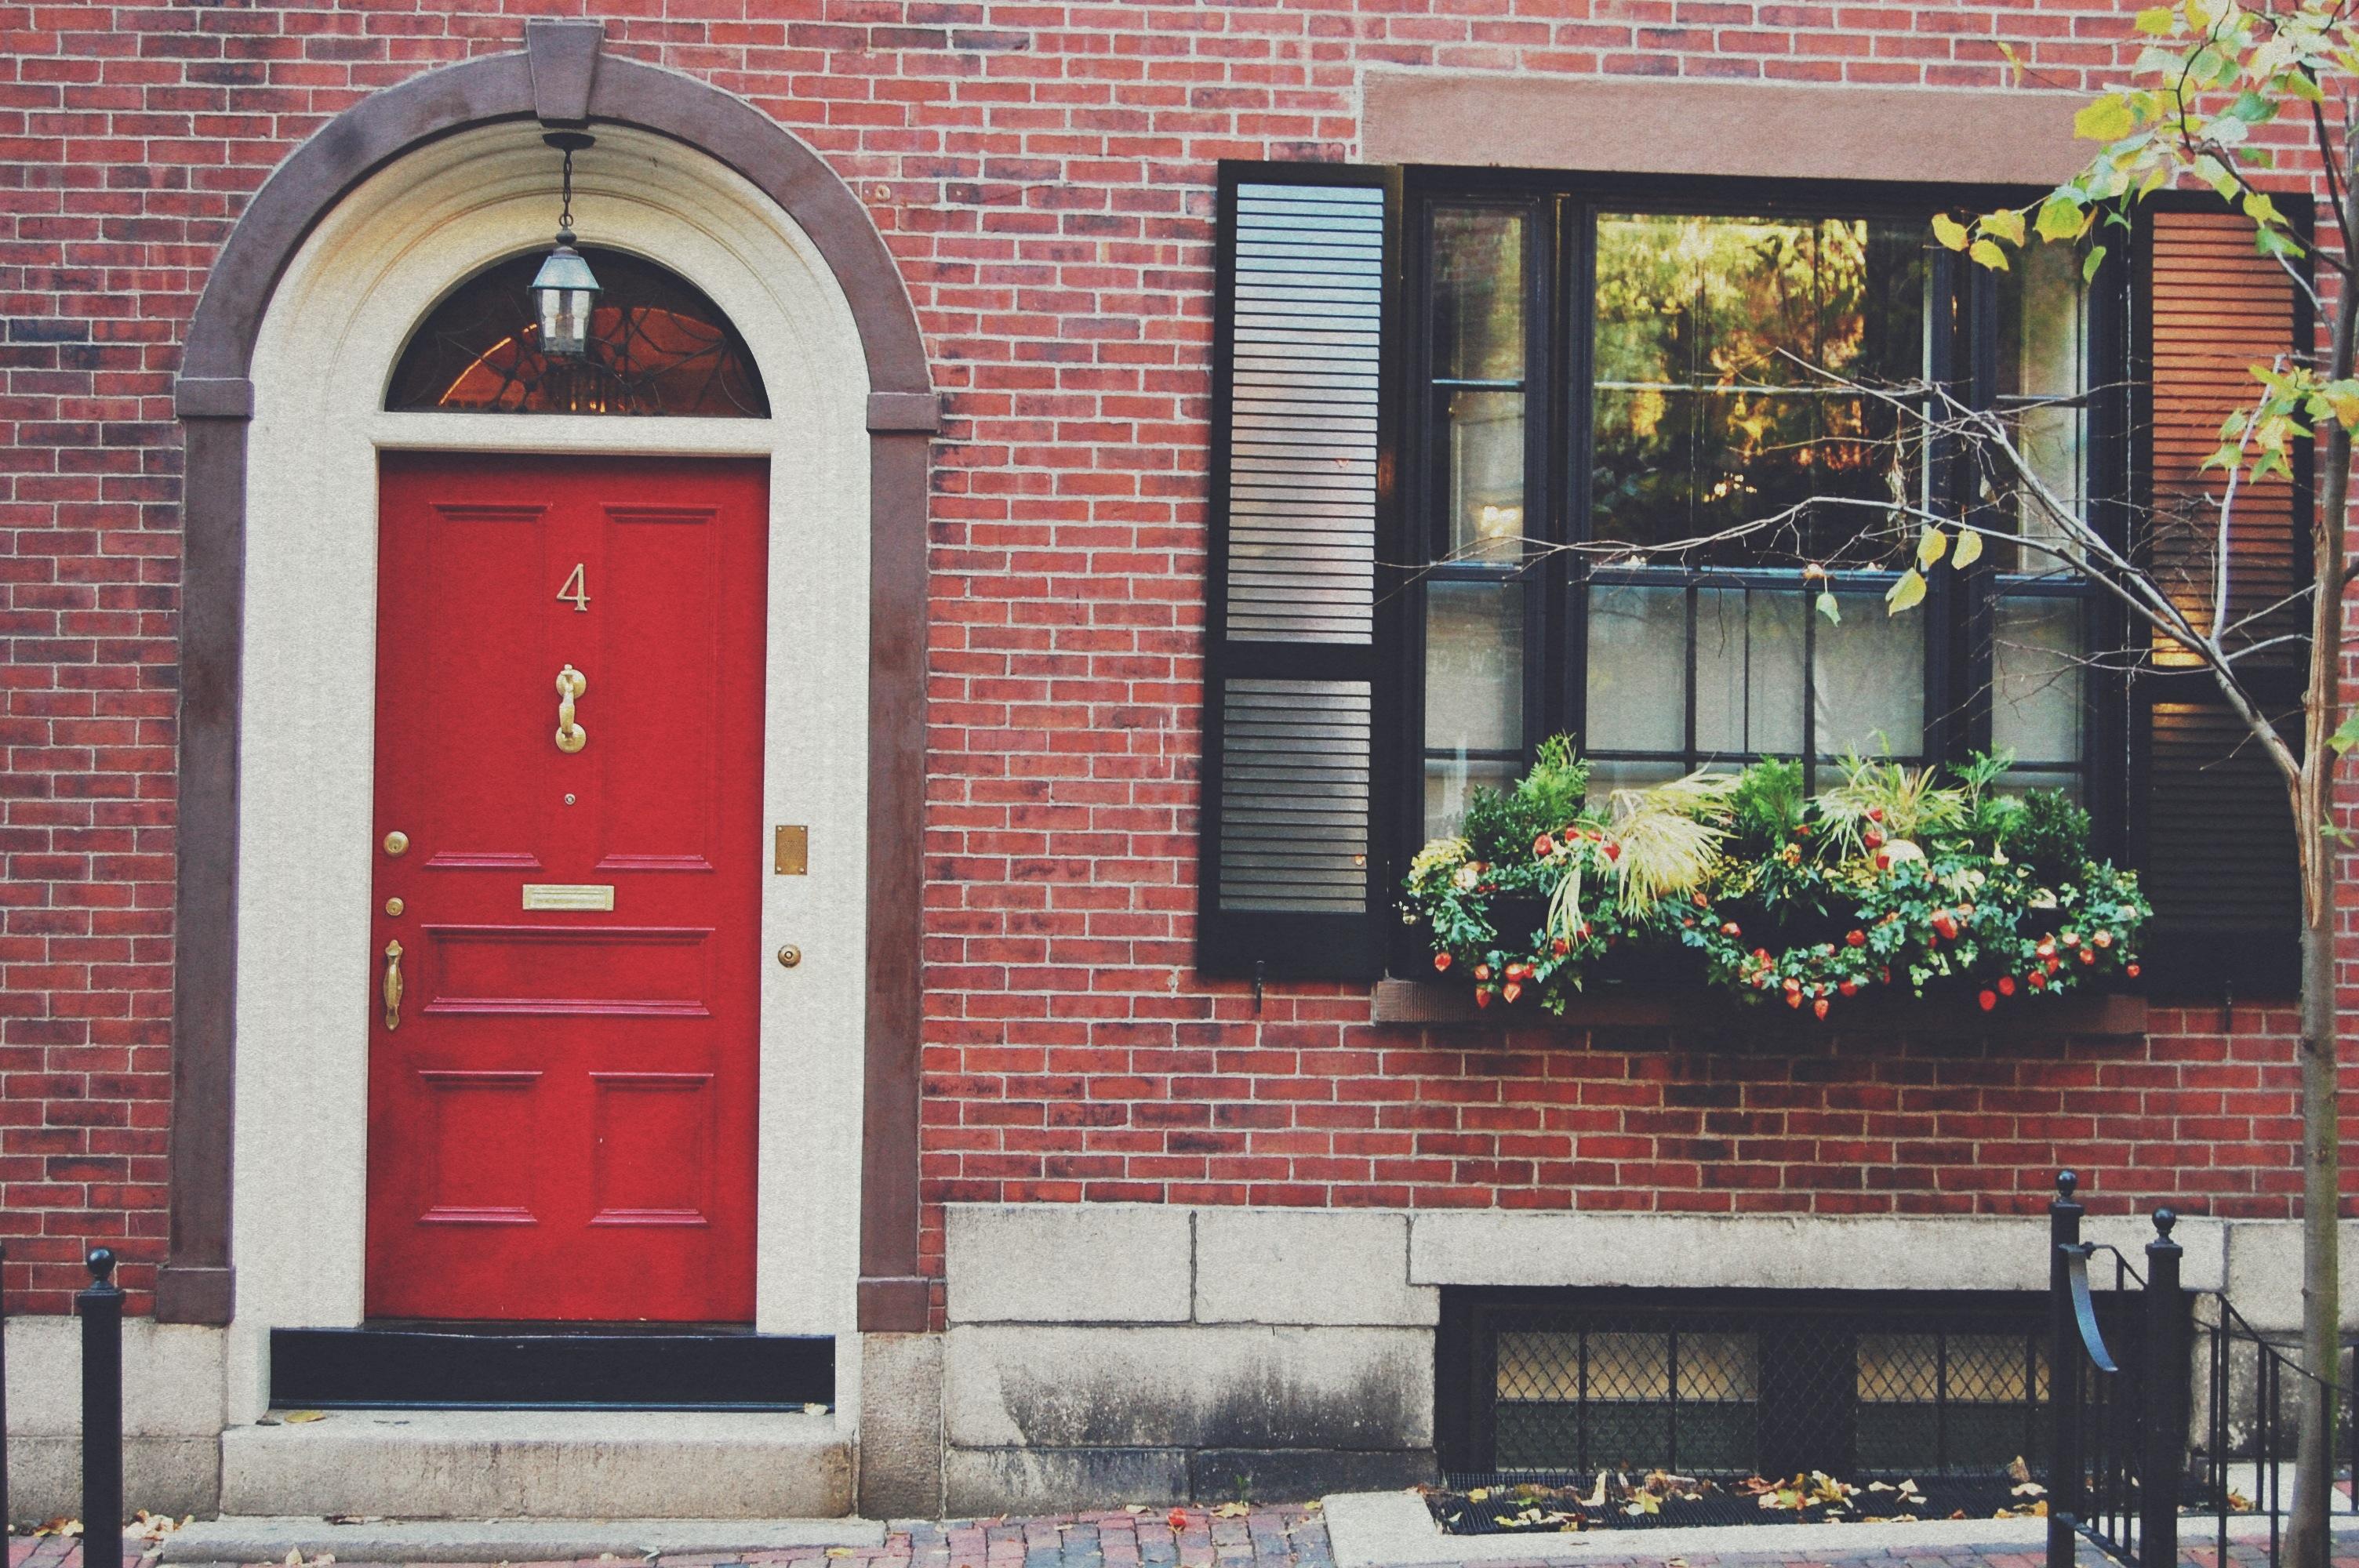 Acorn Street u0026 Other Doors & Acorn Street u0026 Other Doors - shell chicu0027d pezcame.com